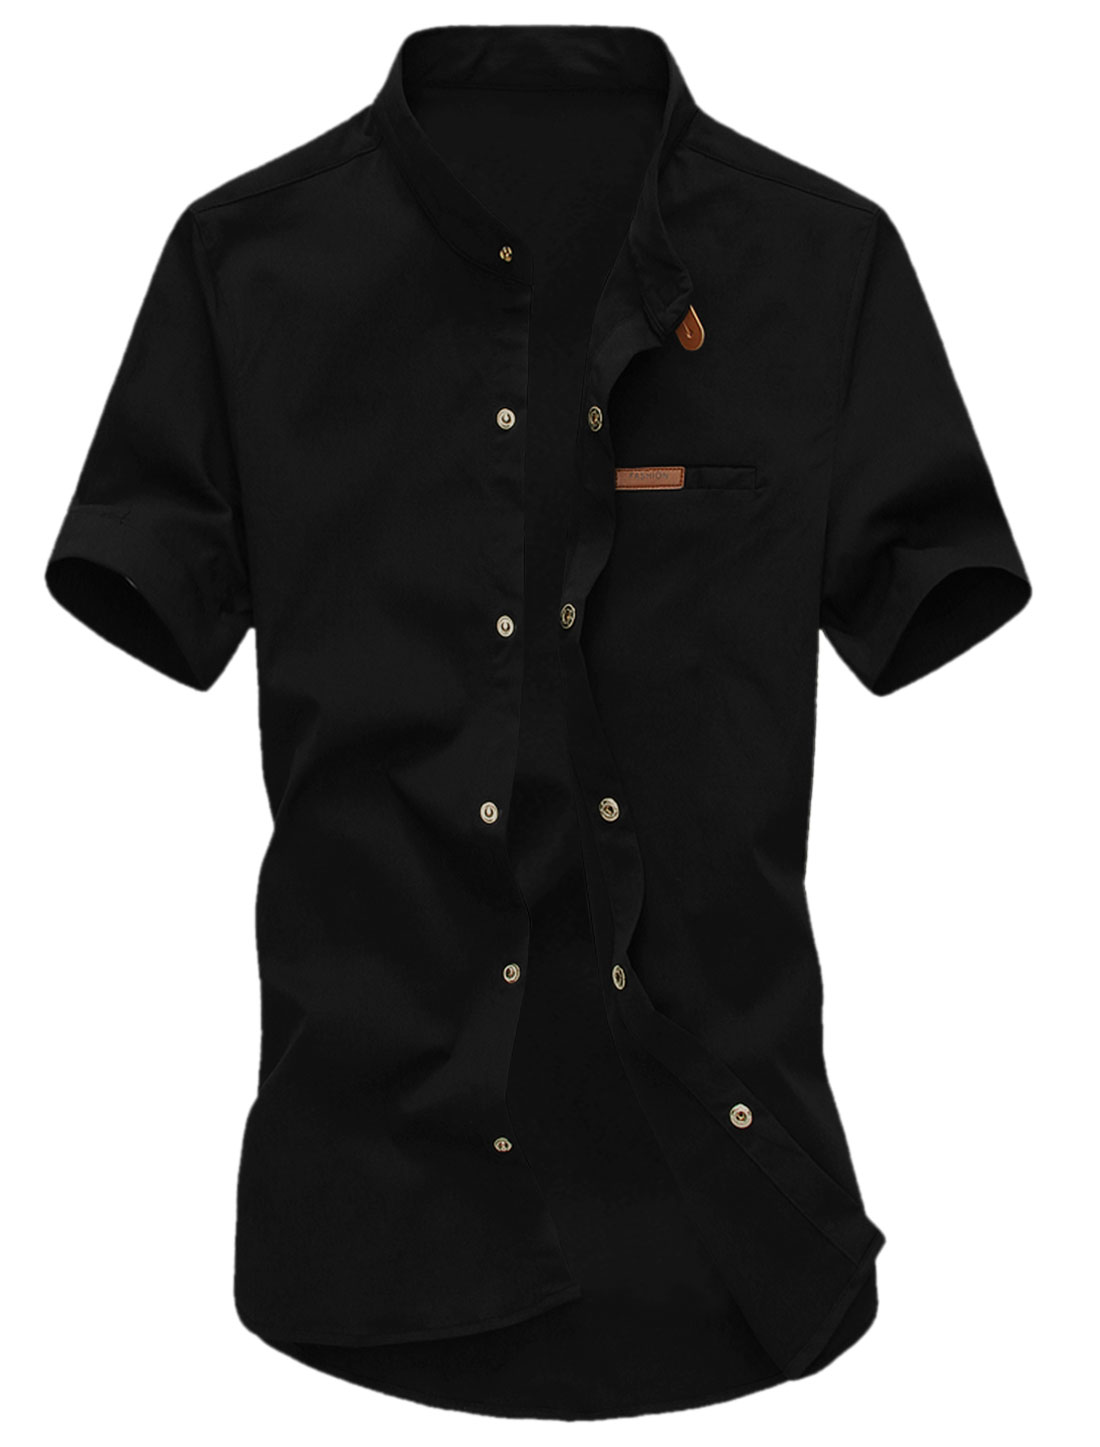 Man Short Sleeves Stand Collar Round Hem Shirts Black M